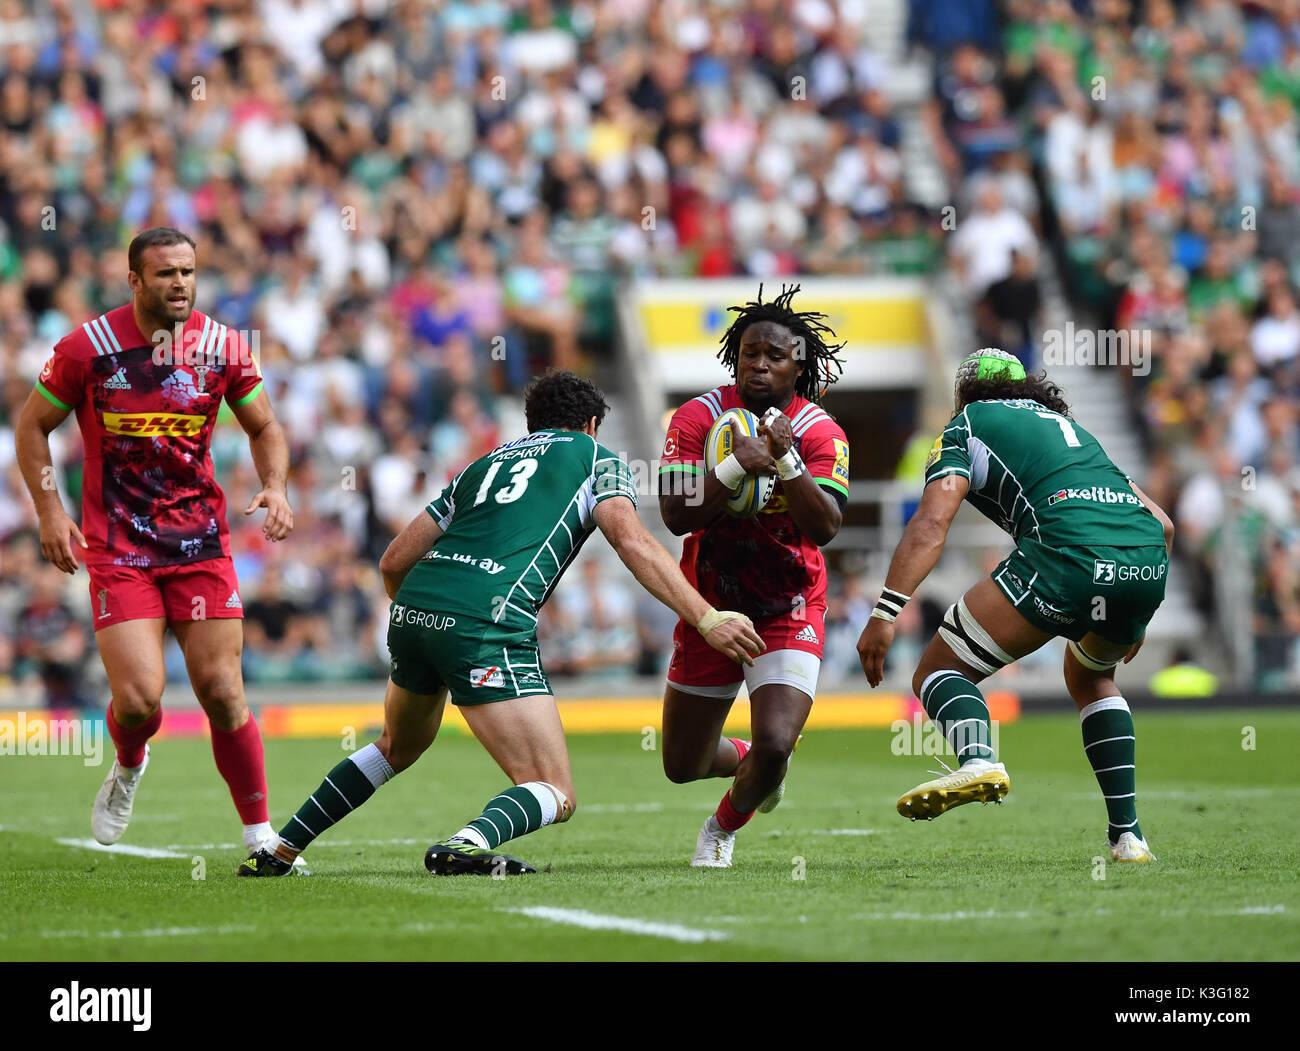 London, UK. 02nd Sep, 2017. Marland Yrade was tackled during Aviva Premiership Rugby London Irish vs Harlequins at Twickenham Stadium on Saturday, 02 September 2017. LONDON ENGLAND. Credit: Taka G Wu Credit: Taka Wu/Alamy Live News - Stock Image